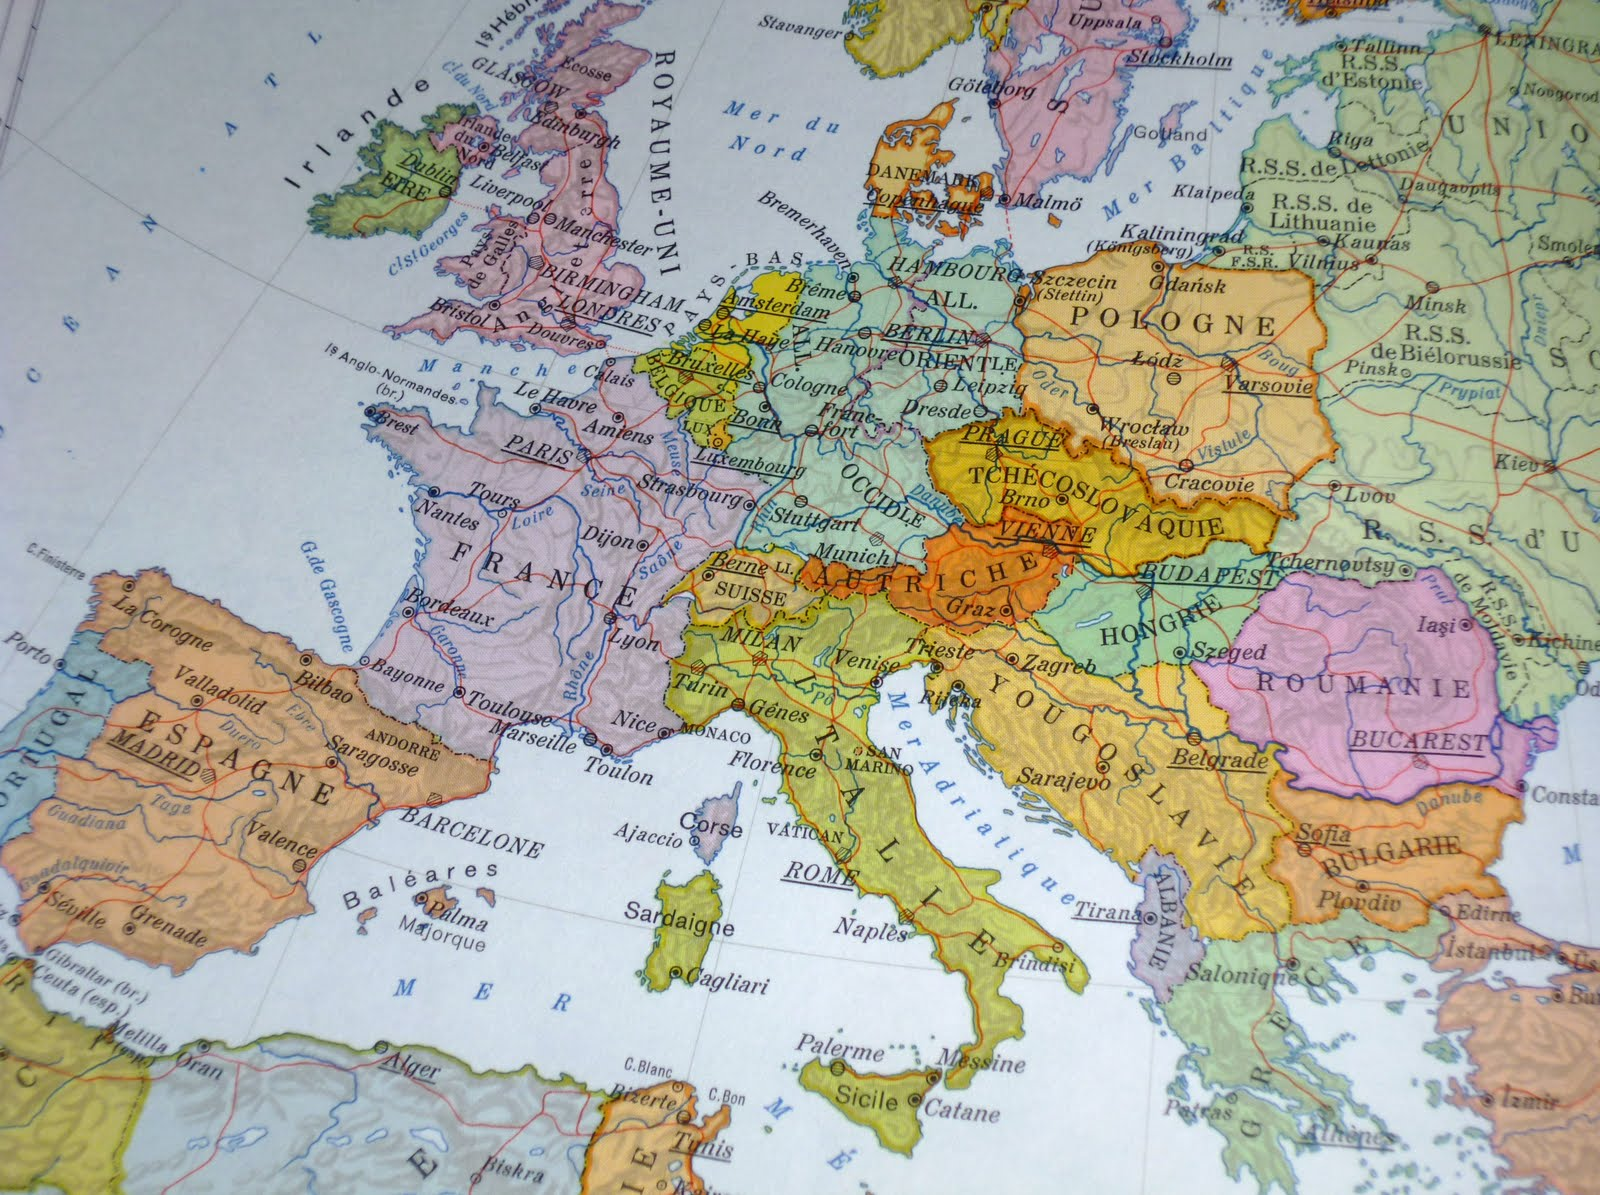 Cartes Postales June 2011 – Travel Map Where I Ve Been